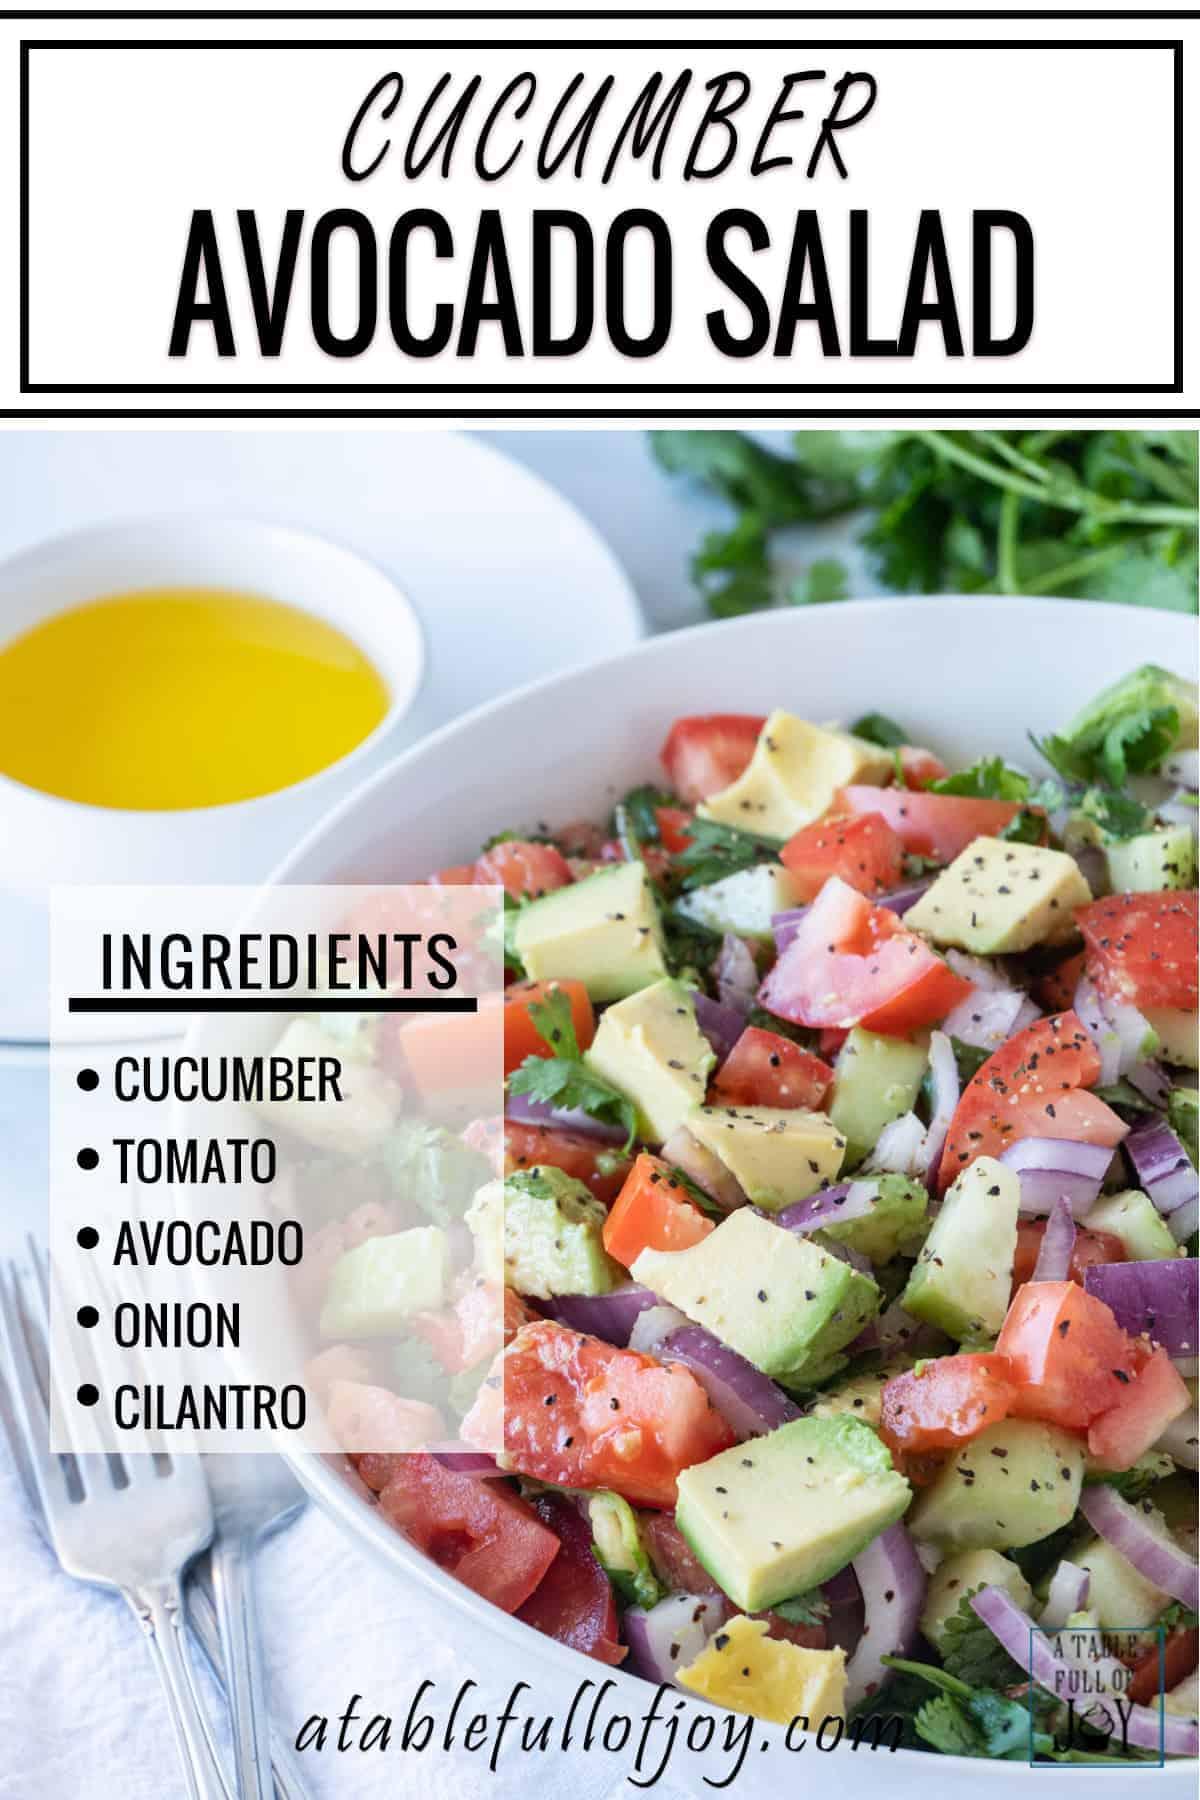 Cucumber Avocado Salad Pinterest Pin